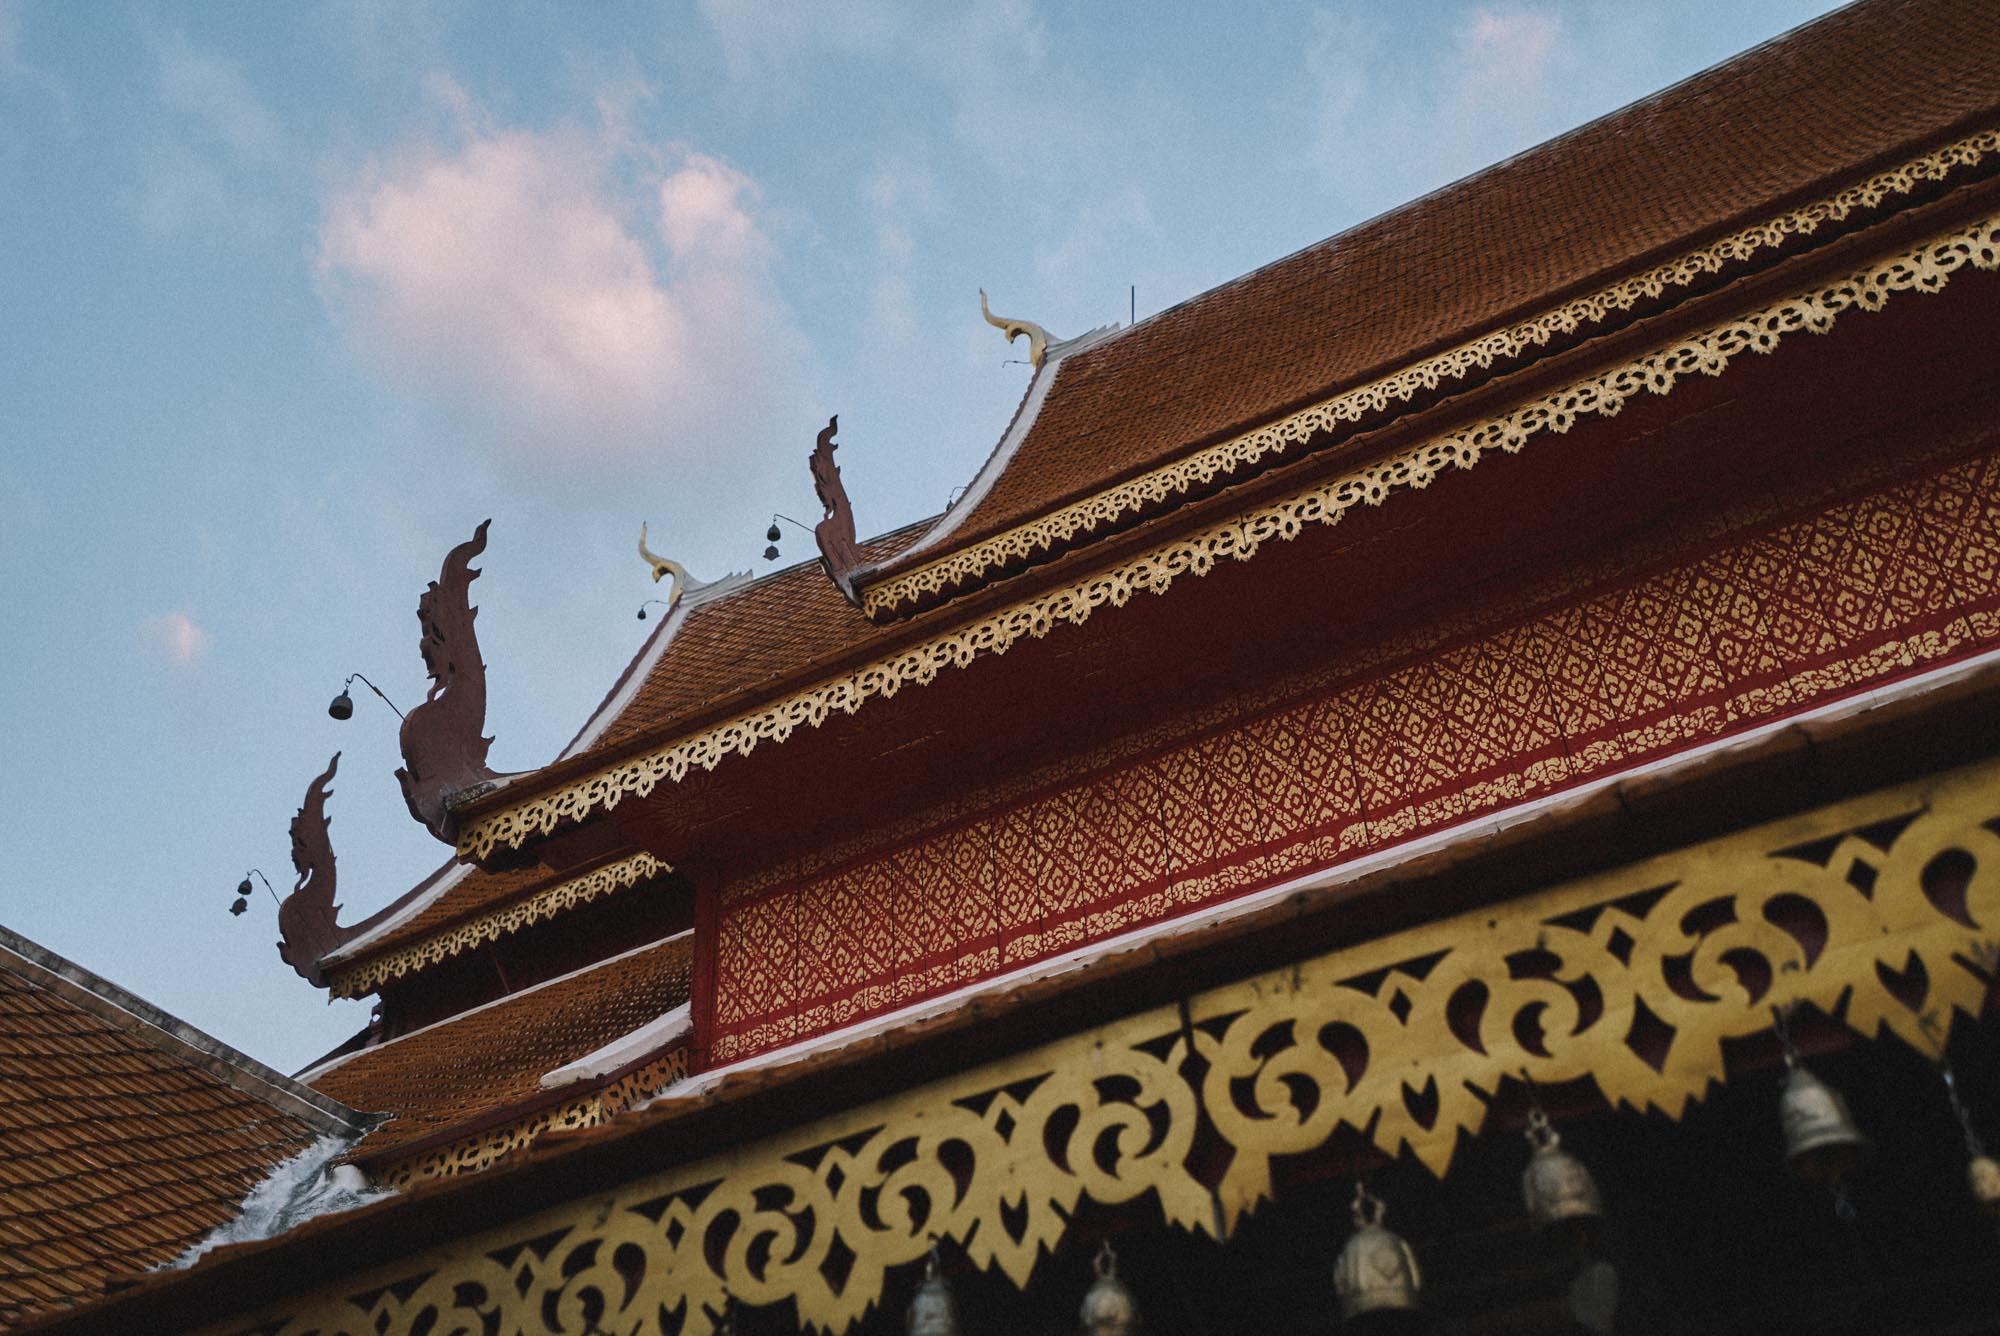 jonathan_chiangmai_v1_0026-2a